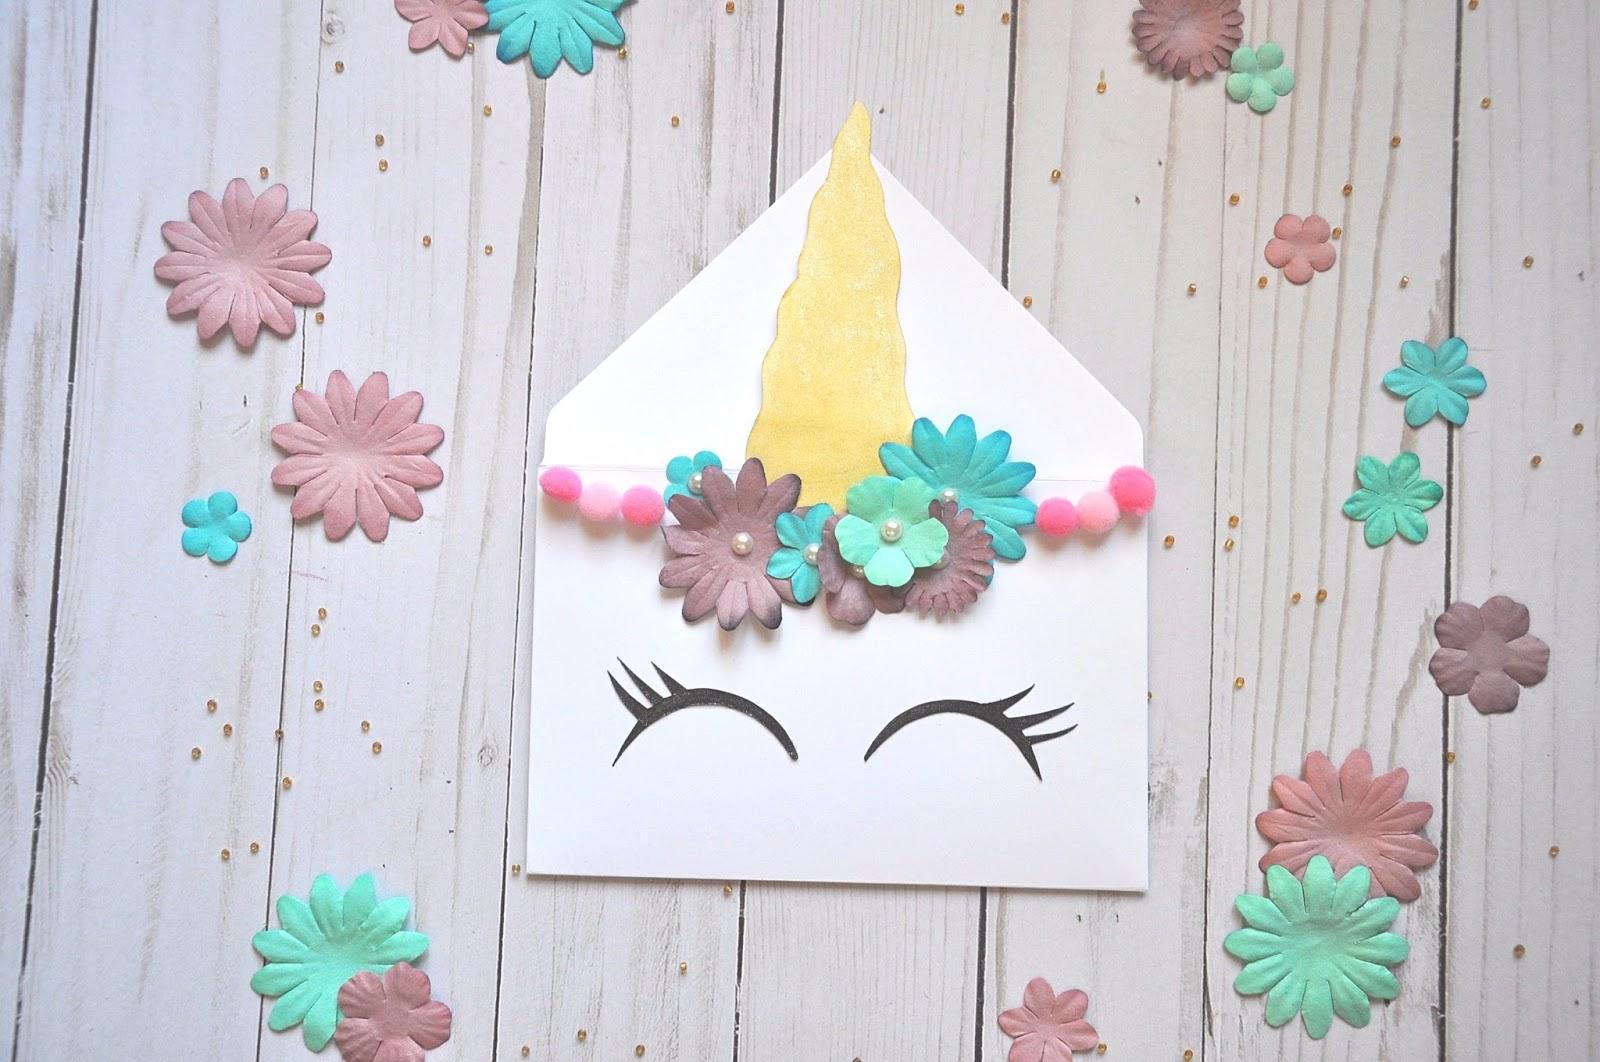 Fsn sobre decorado con tem tica de unicornio for Decoracion para la pared de unicornio